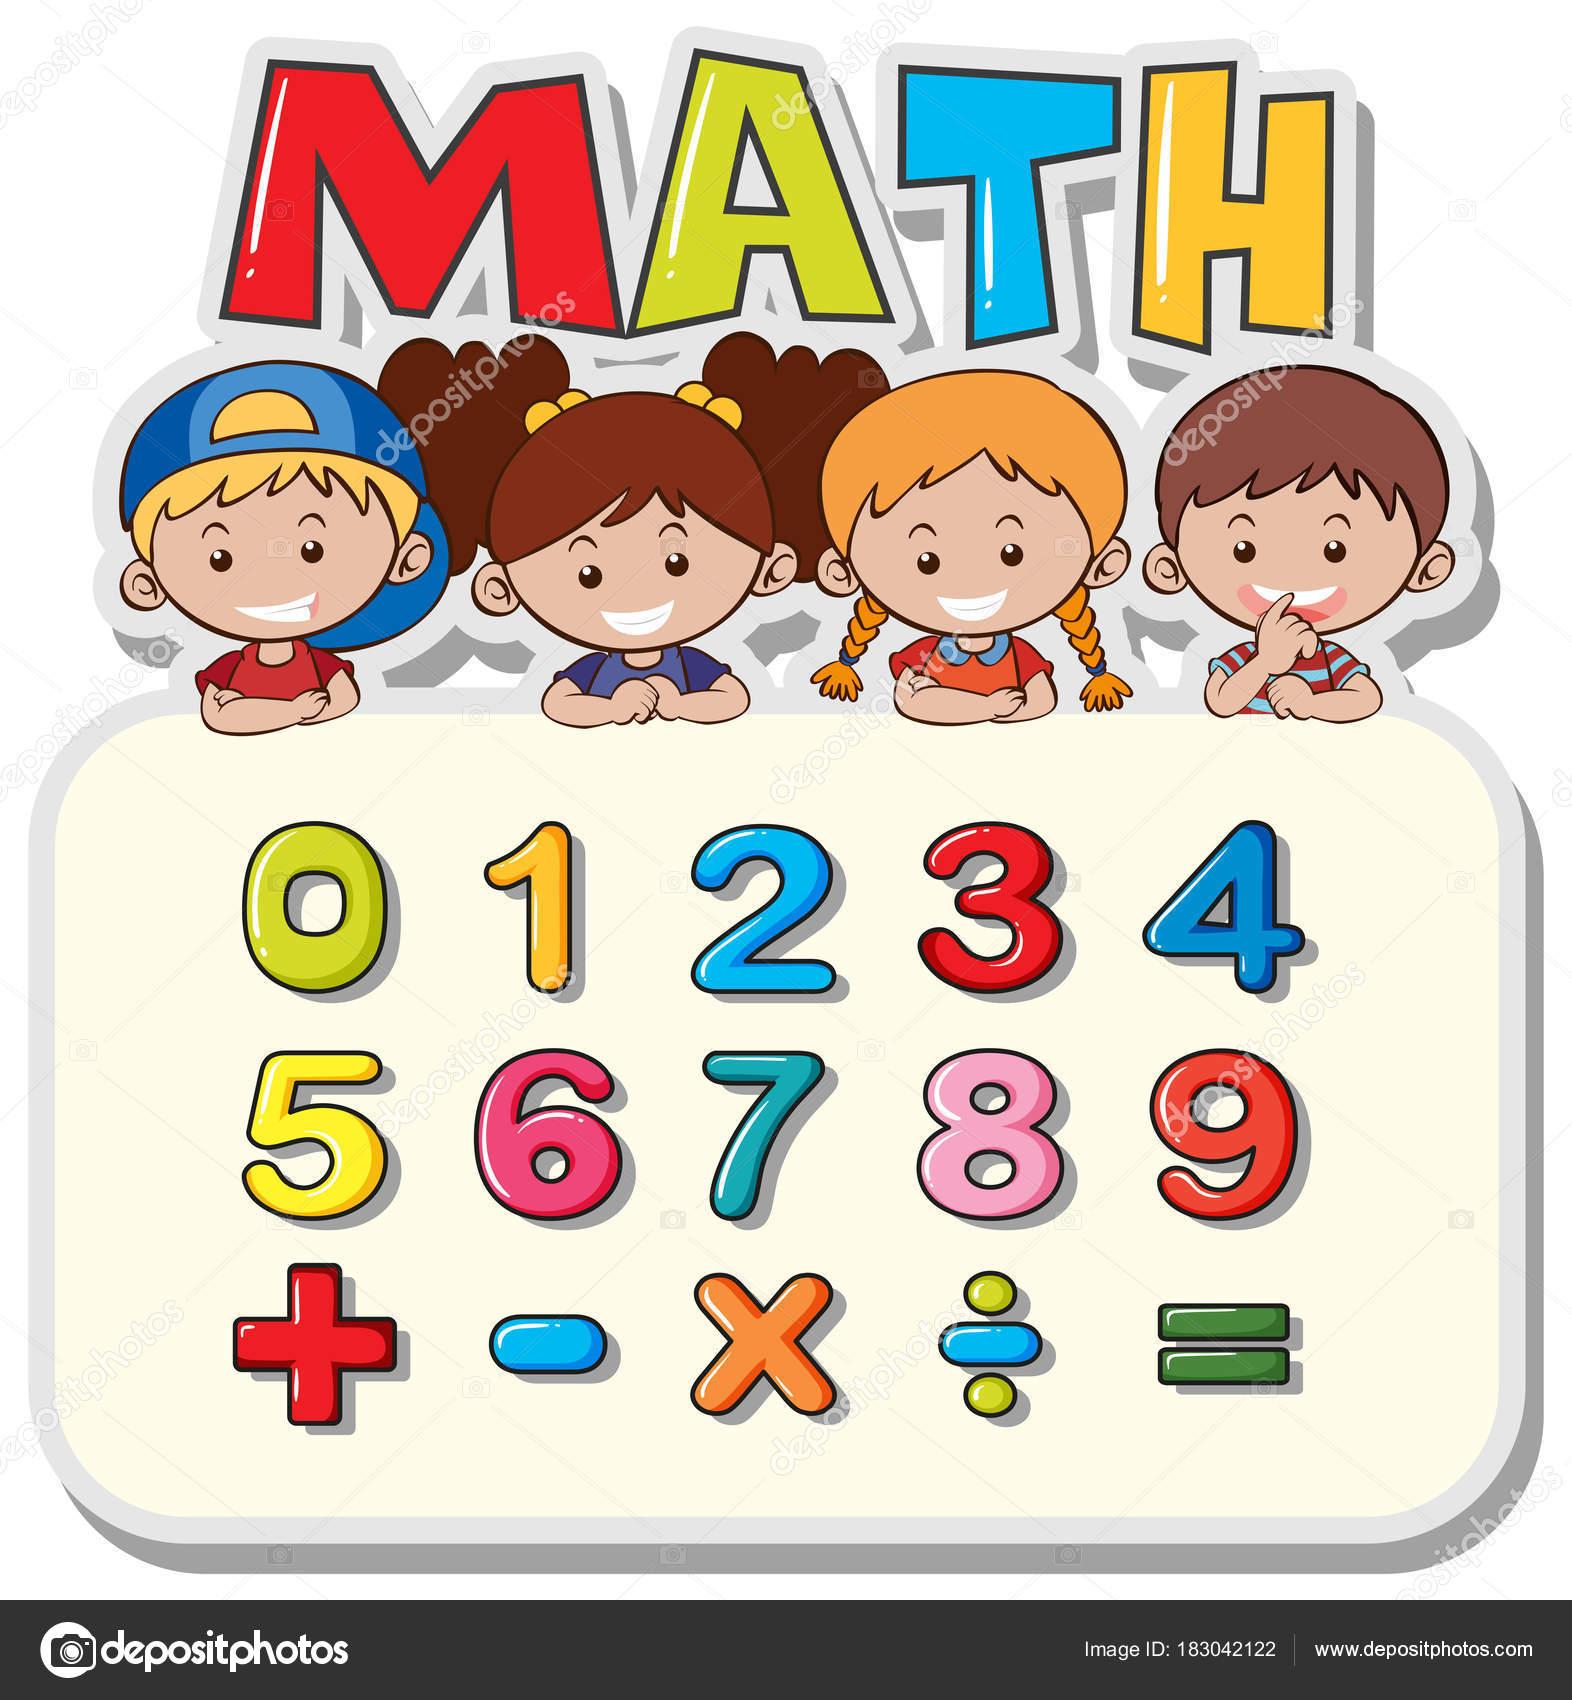 Mathe Arbeitsblatt mit Kindern und Zahlen — Stockvektor ...